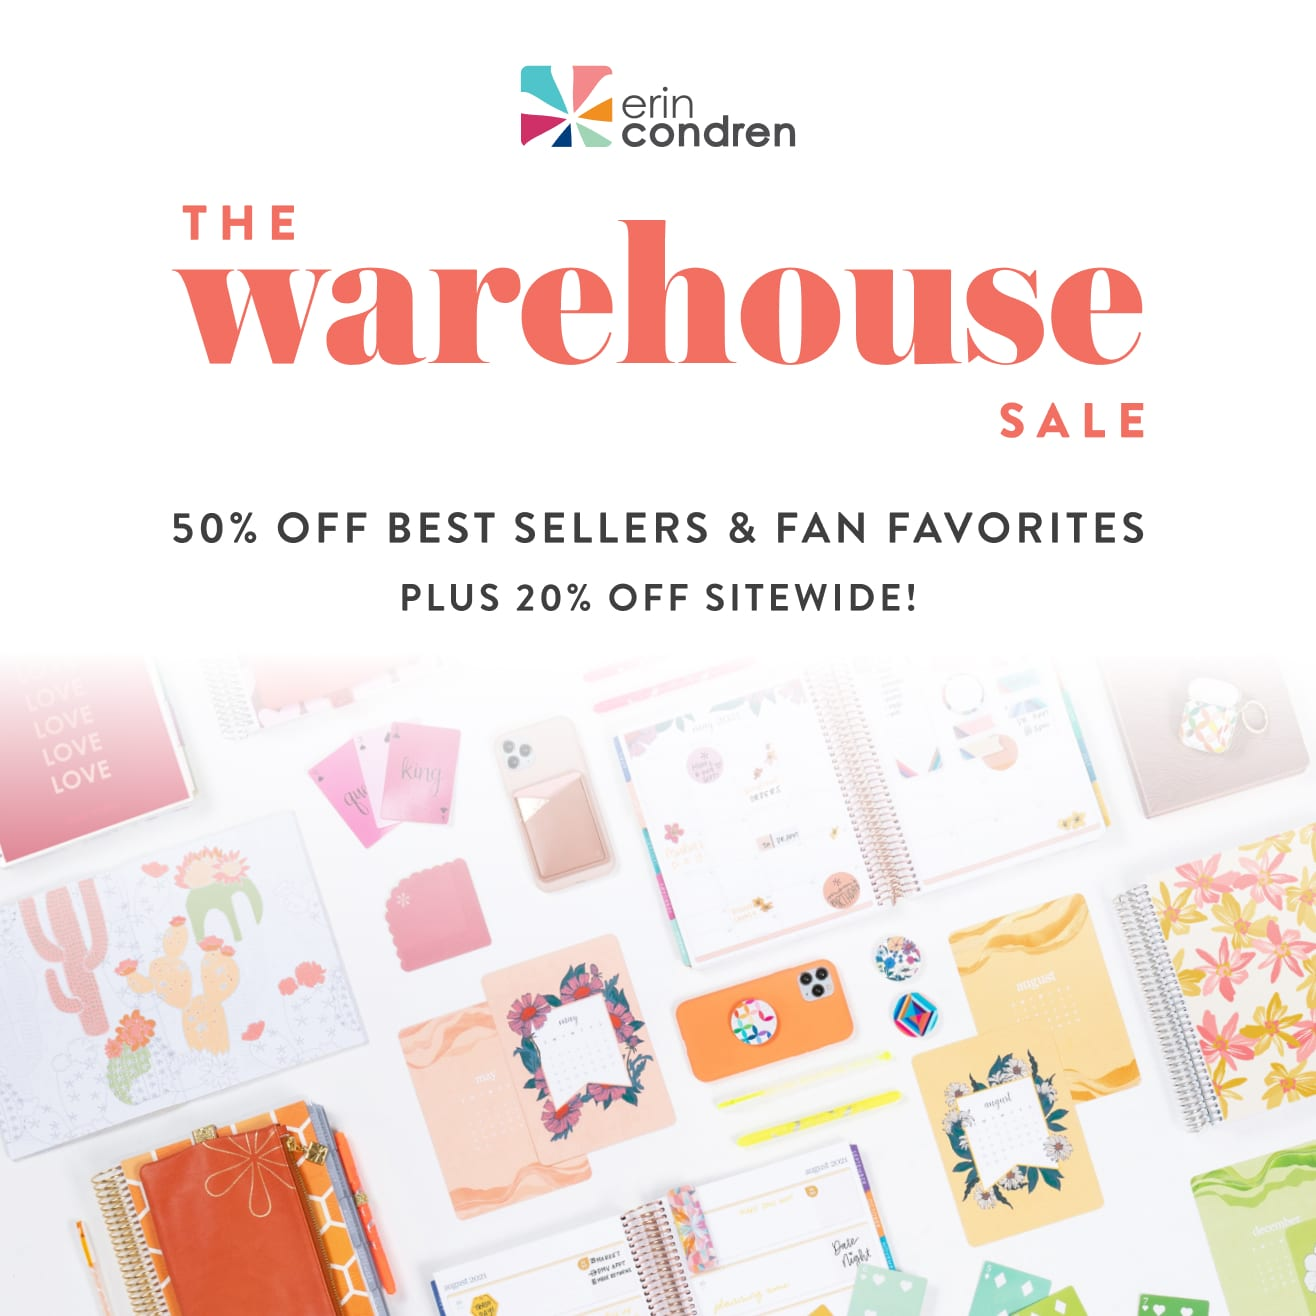 Erin Condren  Sale - Biannual warehouse sale